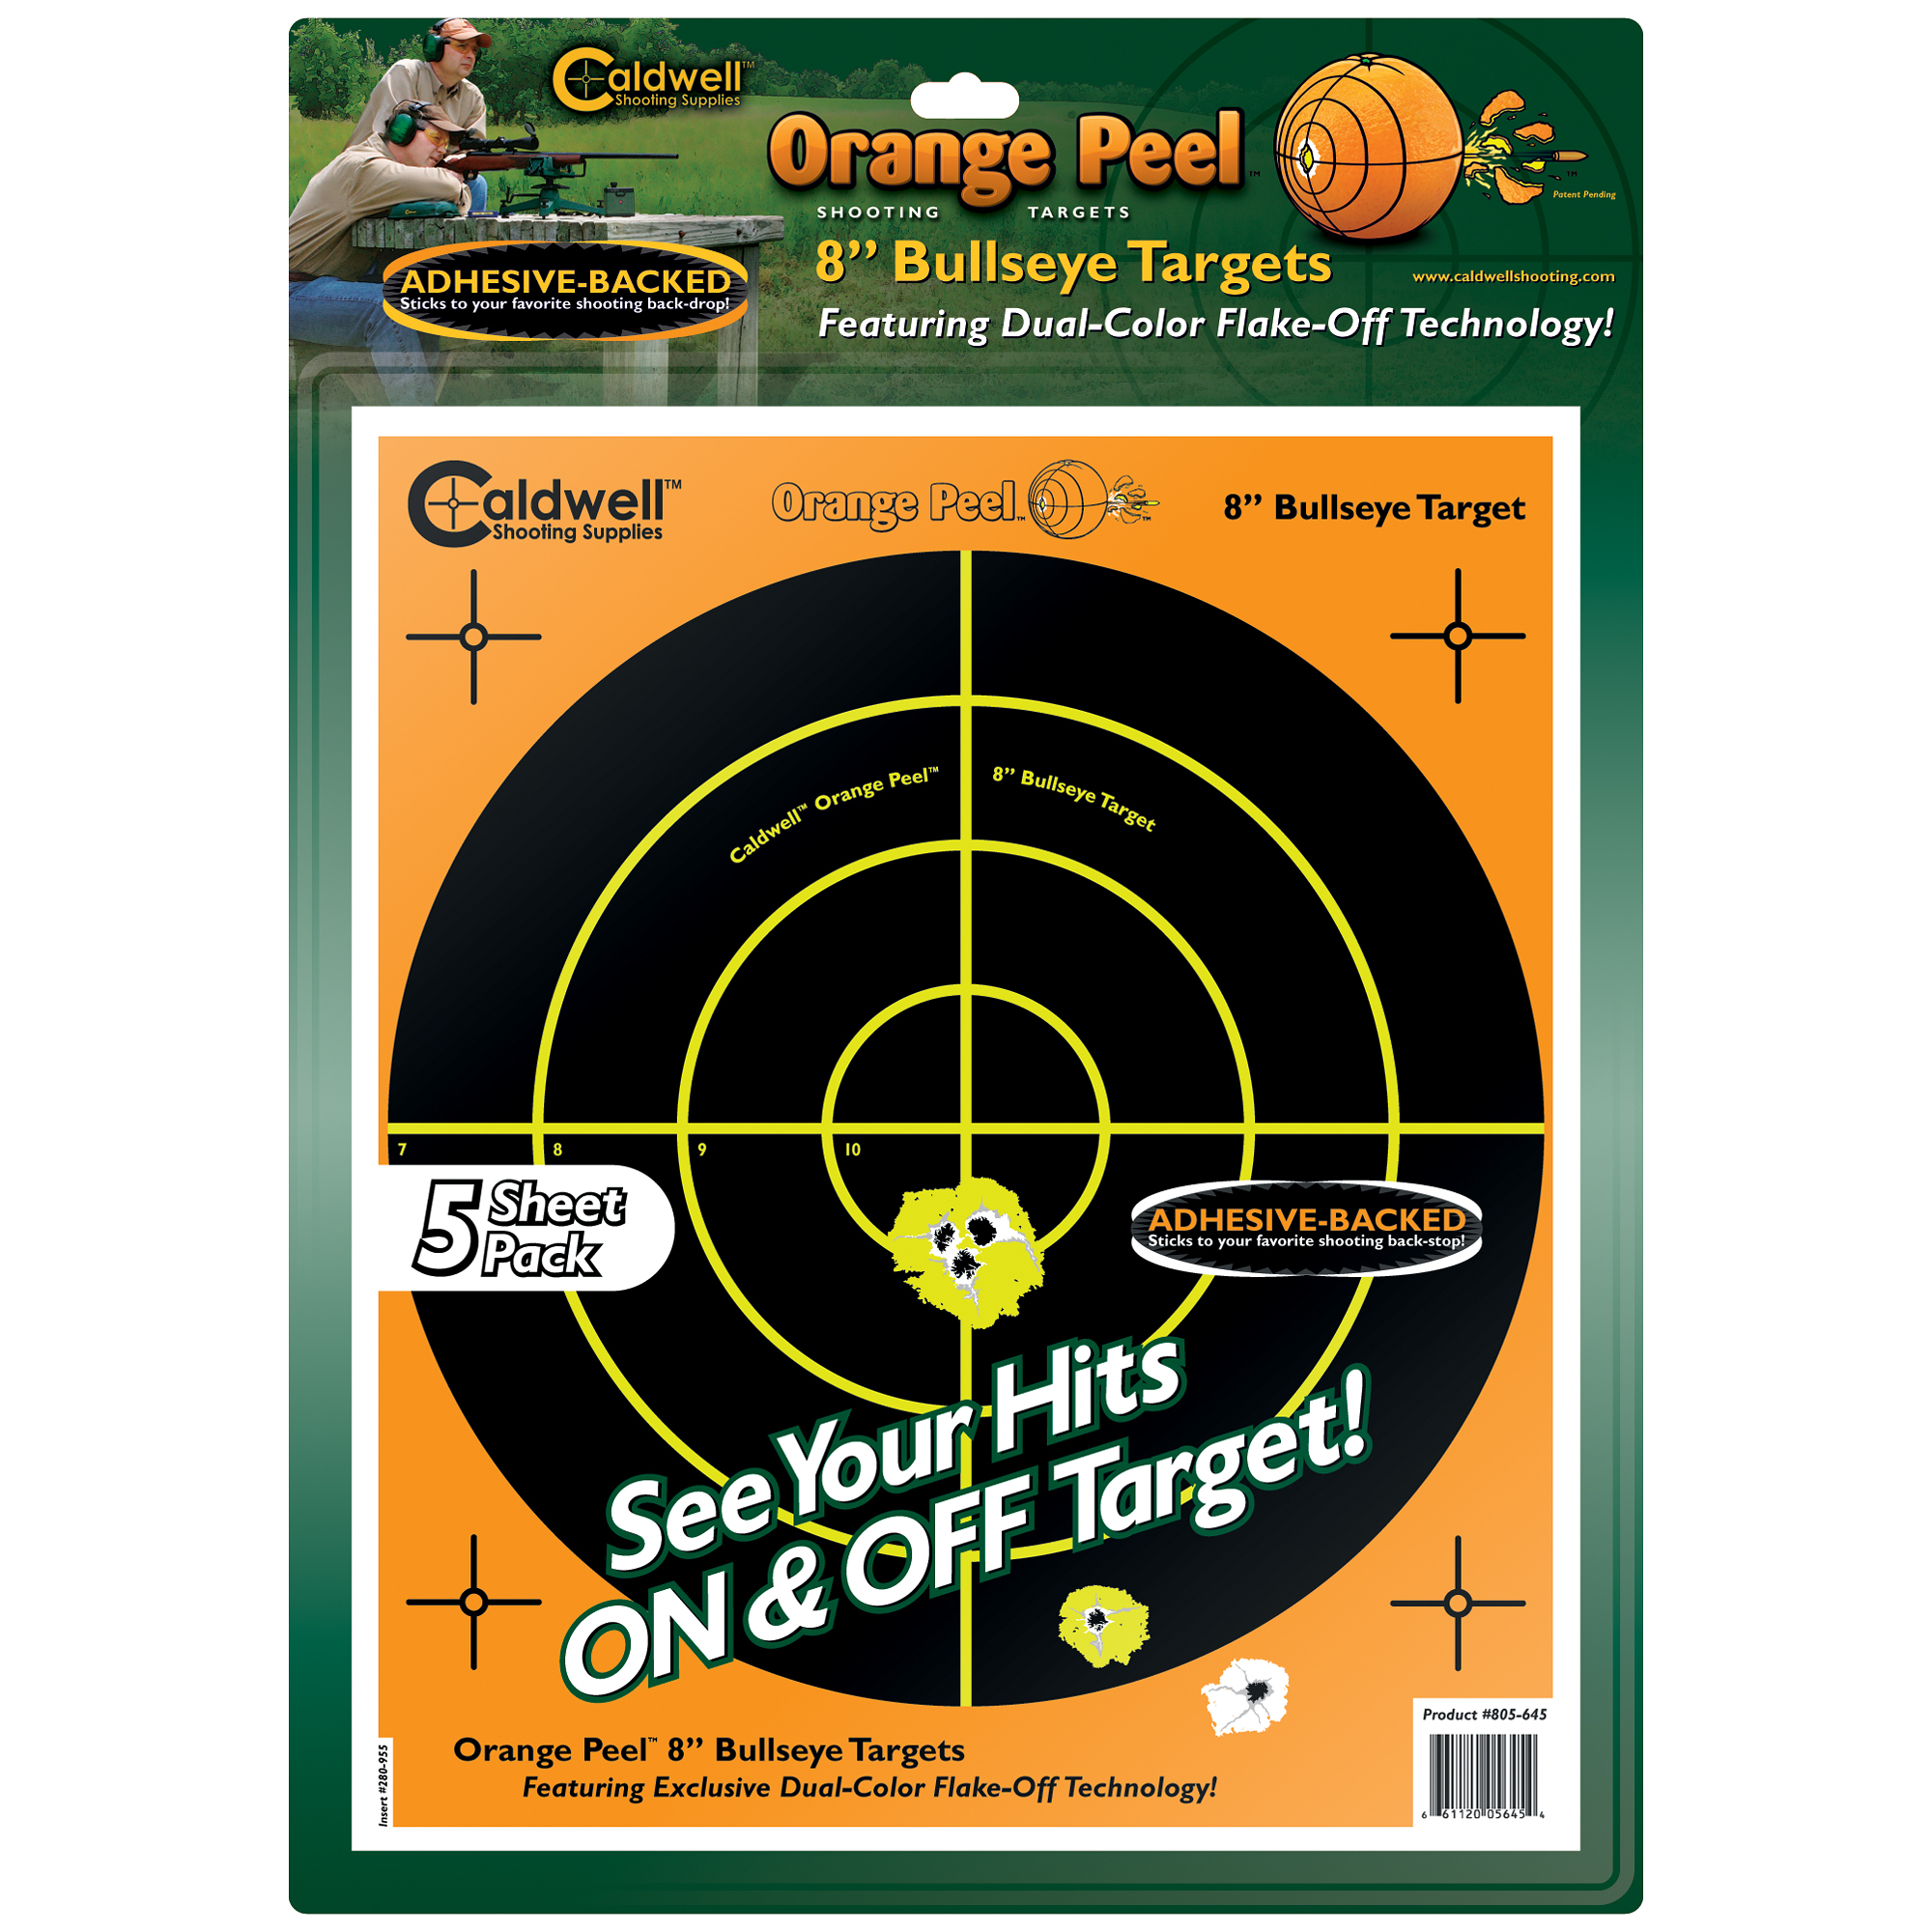 "Caldwell Ornge Peel Bulls-eye 8""(5)"